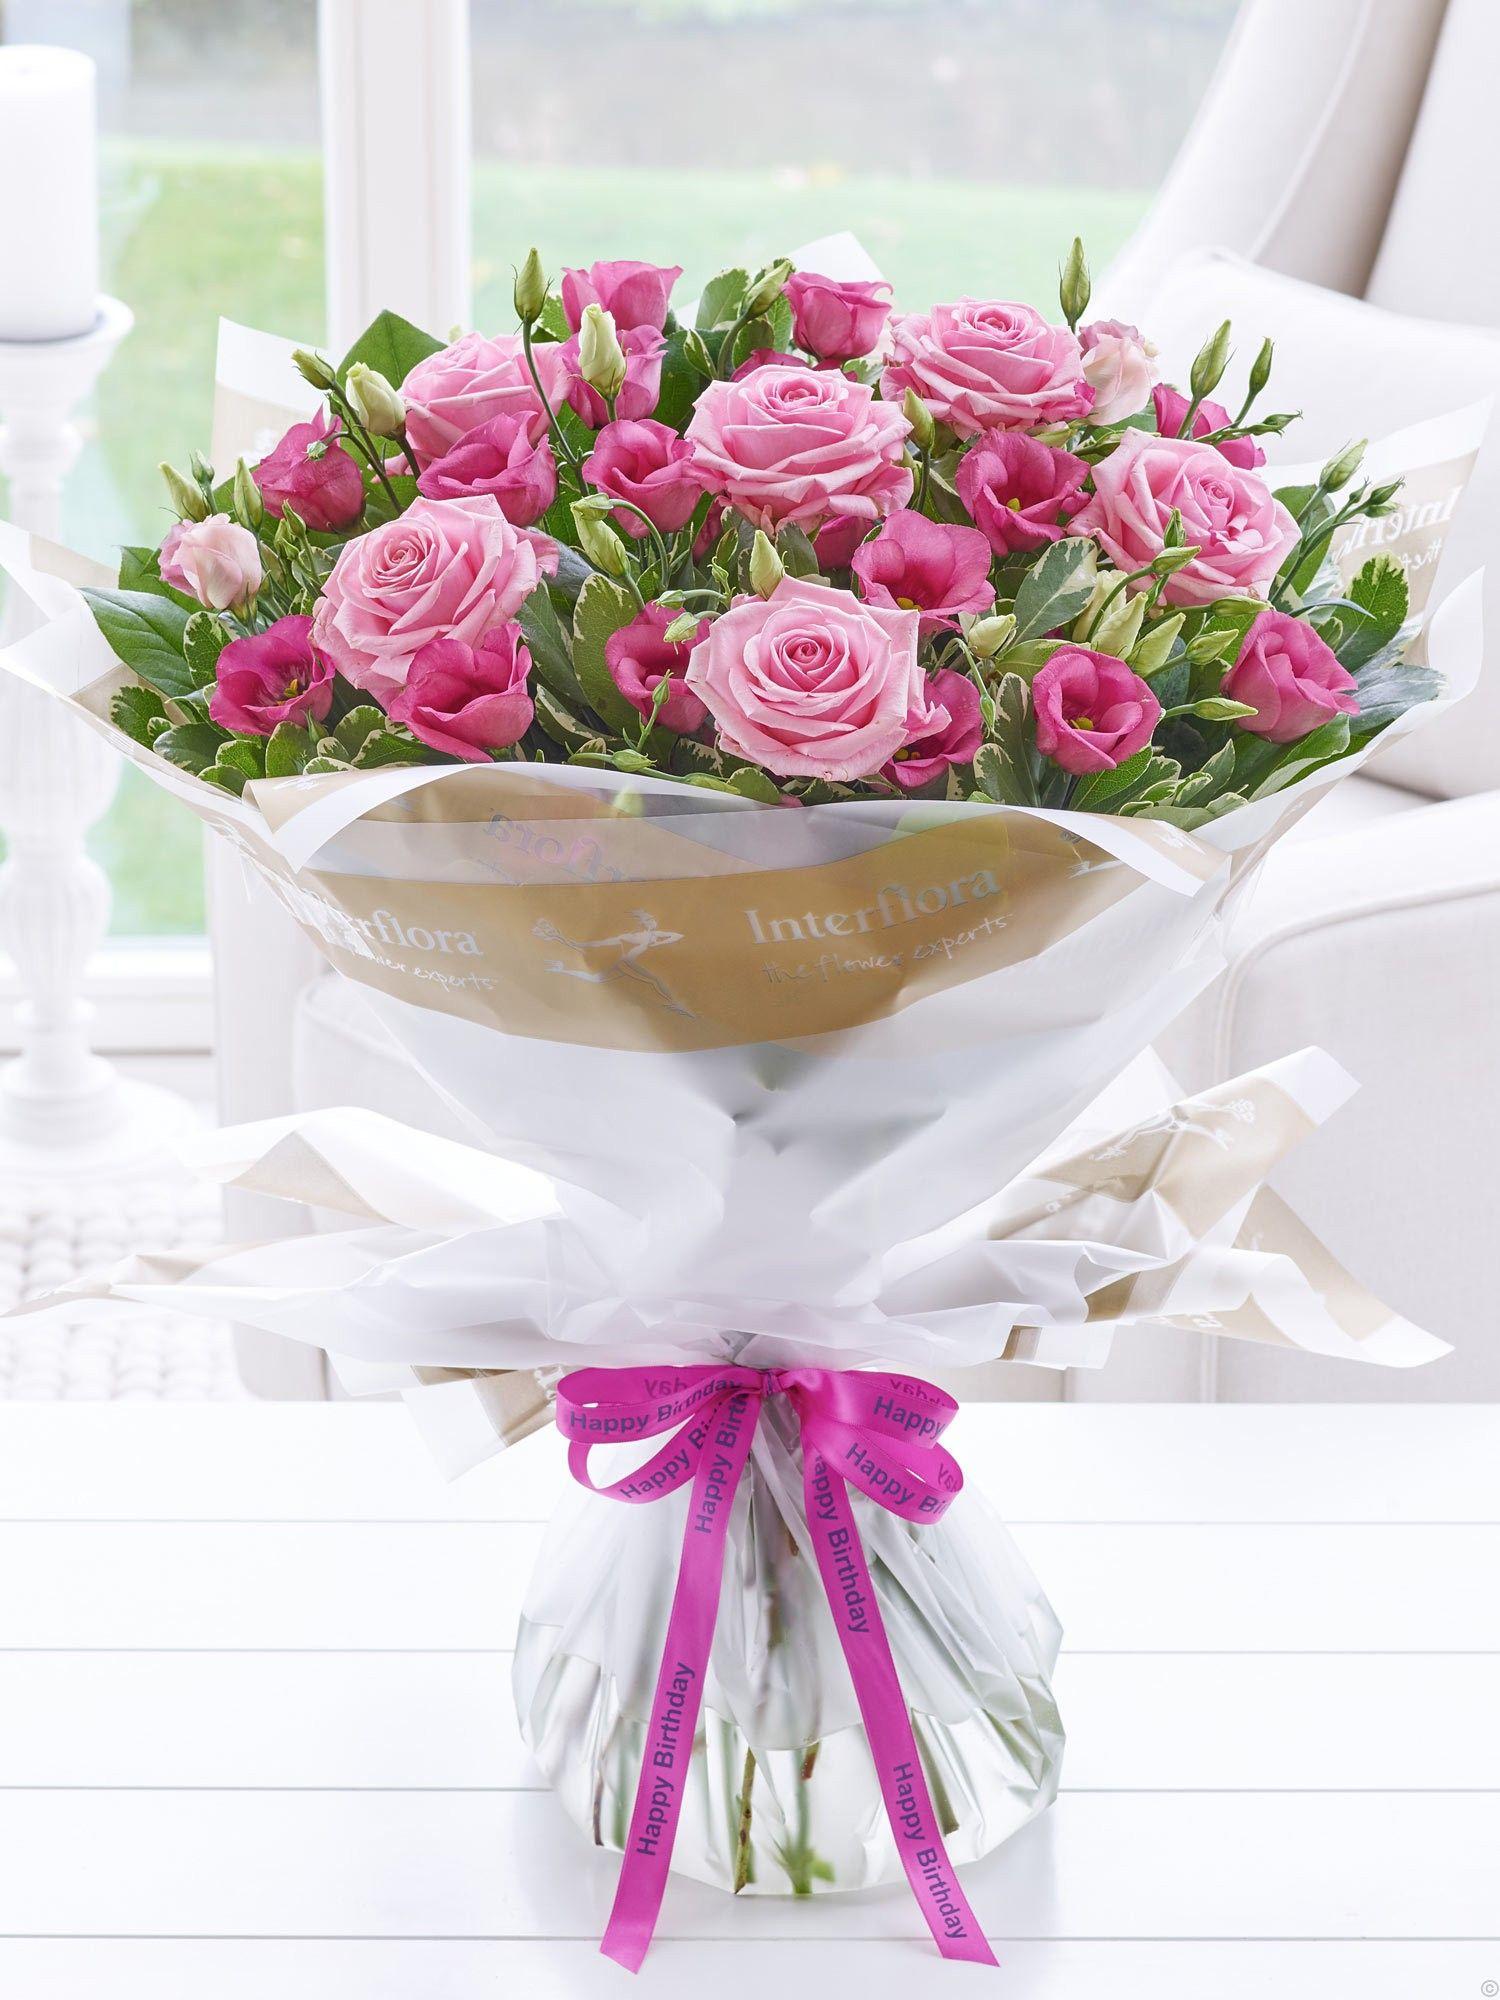 Bilderesultat for happy birthday flowers birthdays pinterest bilderesultat for happy birthday flowers izmirmasajfo